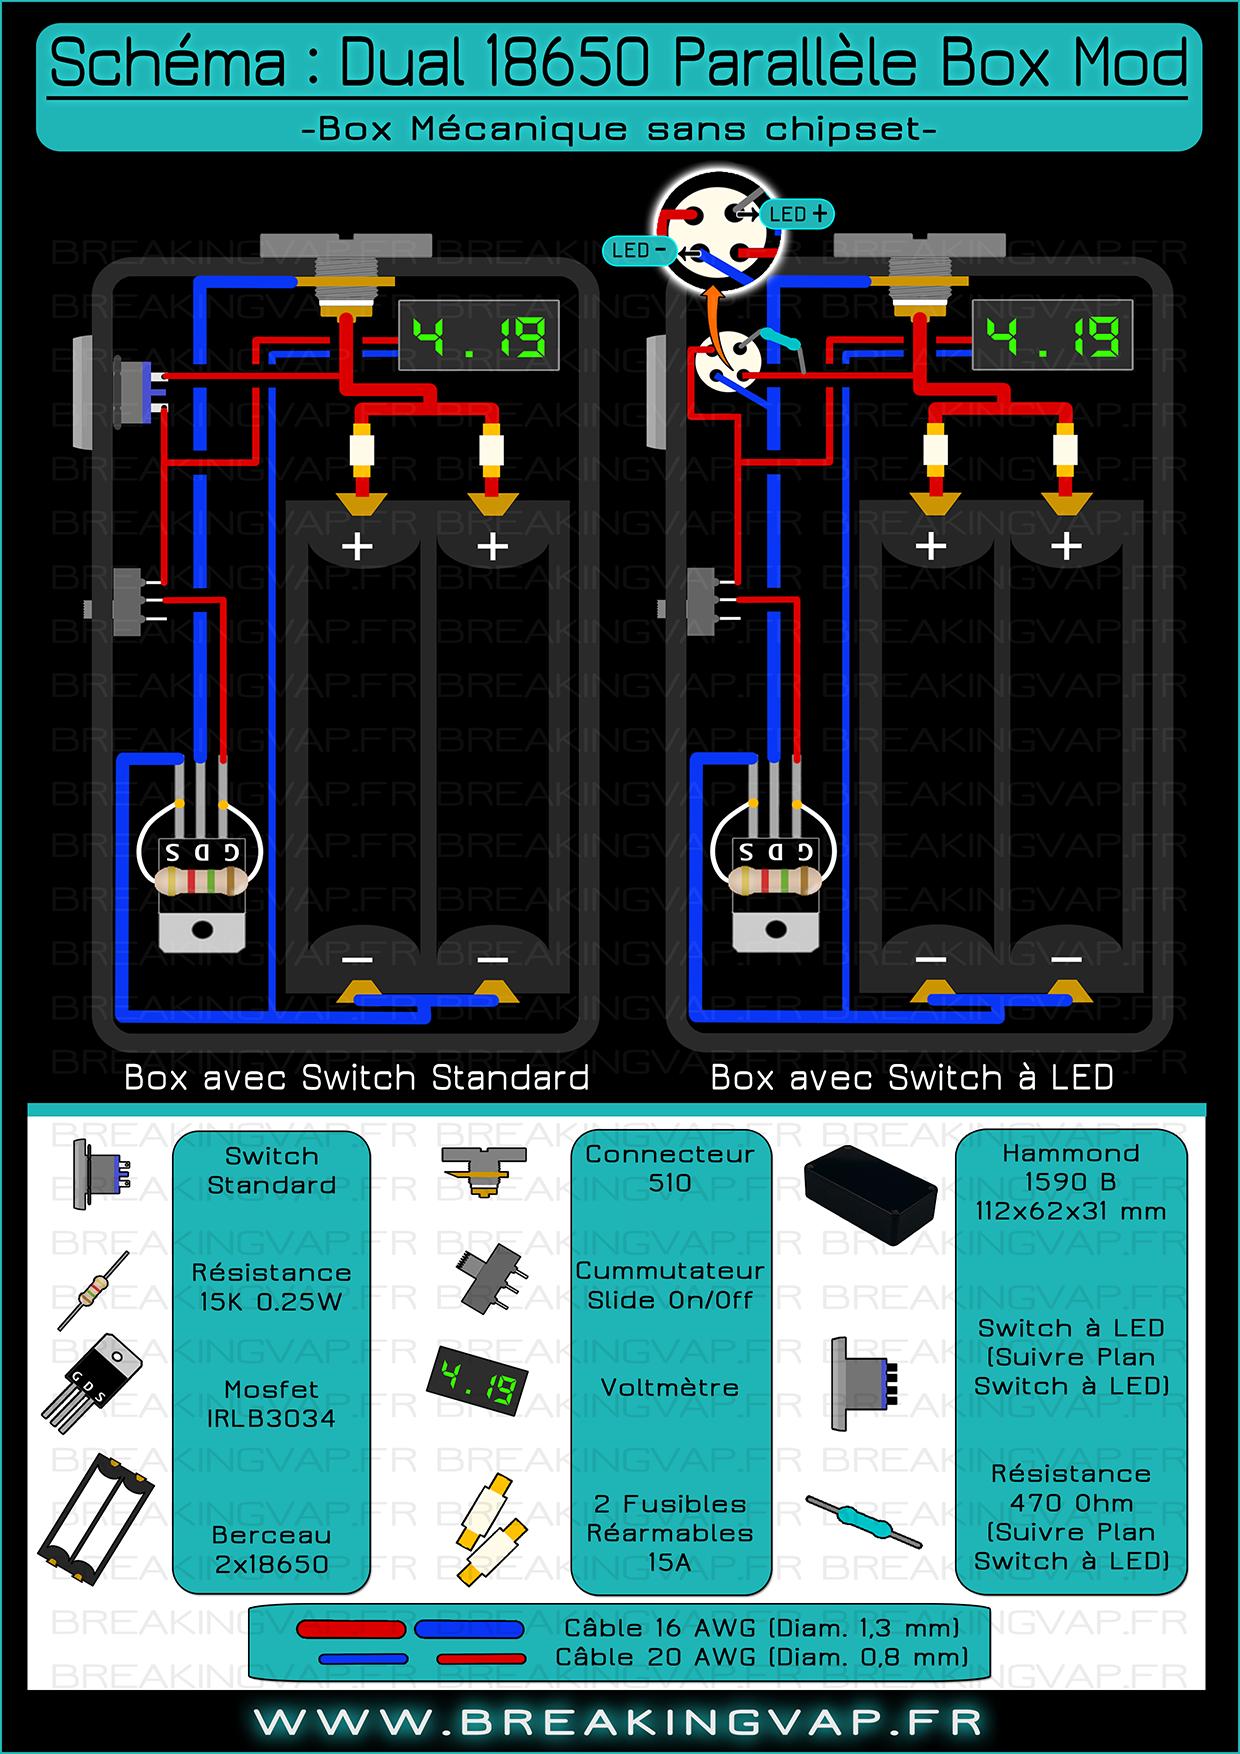 medium resolution of sch ma box mod dual 18650 parallele vapeboxmods